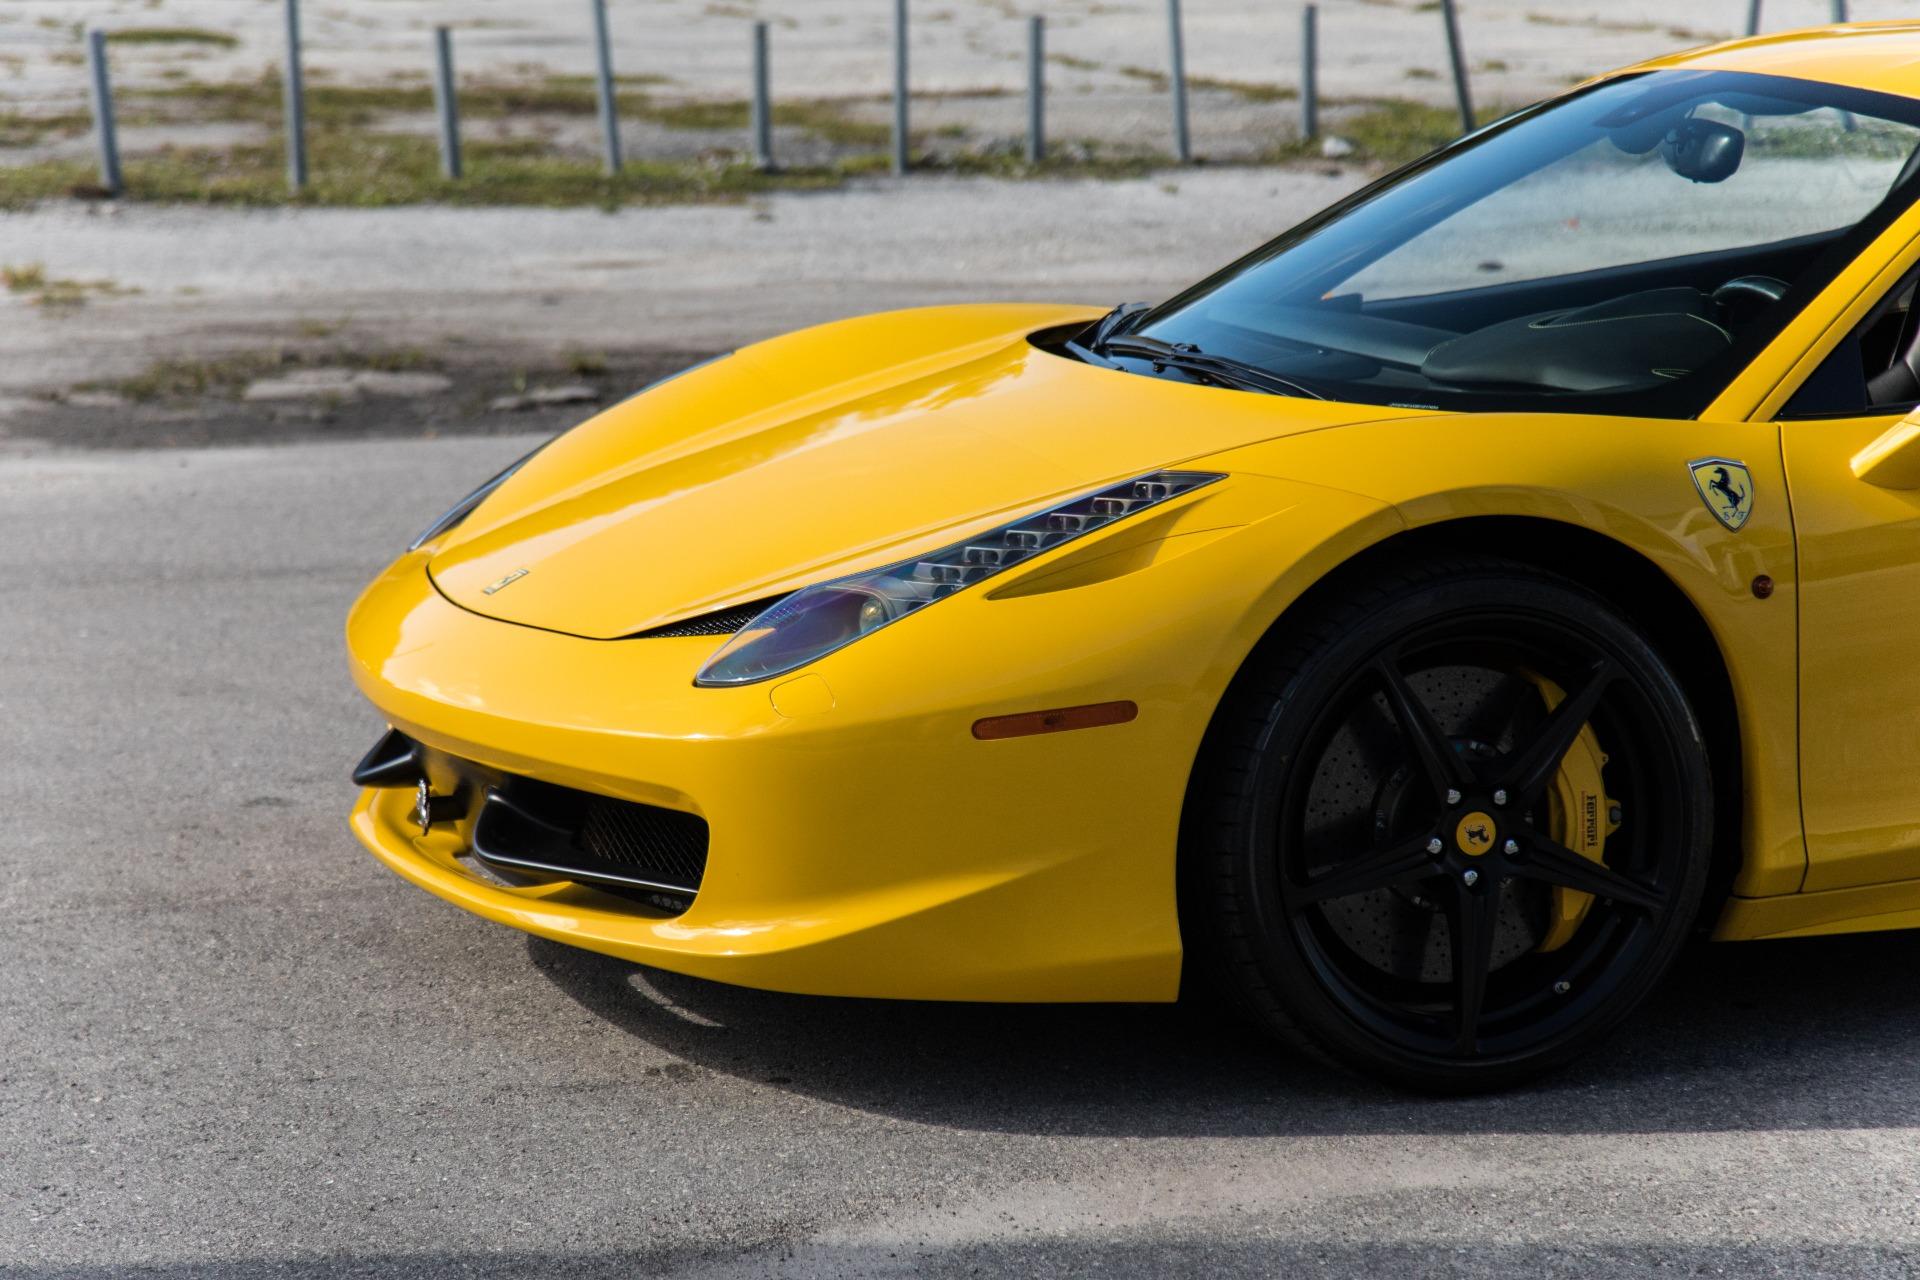 used 2011 ferrari 458 italia for sale   174 900